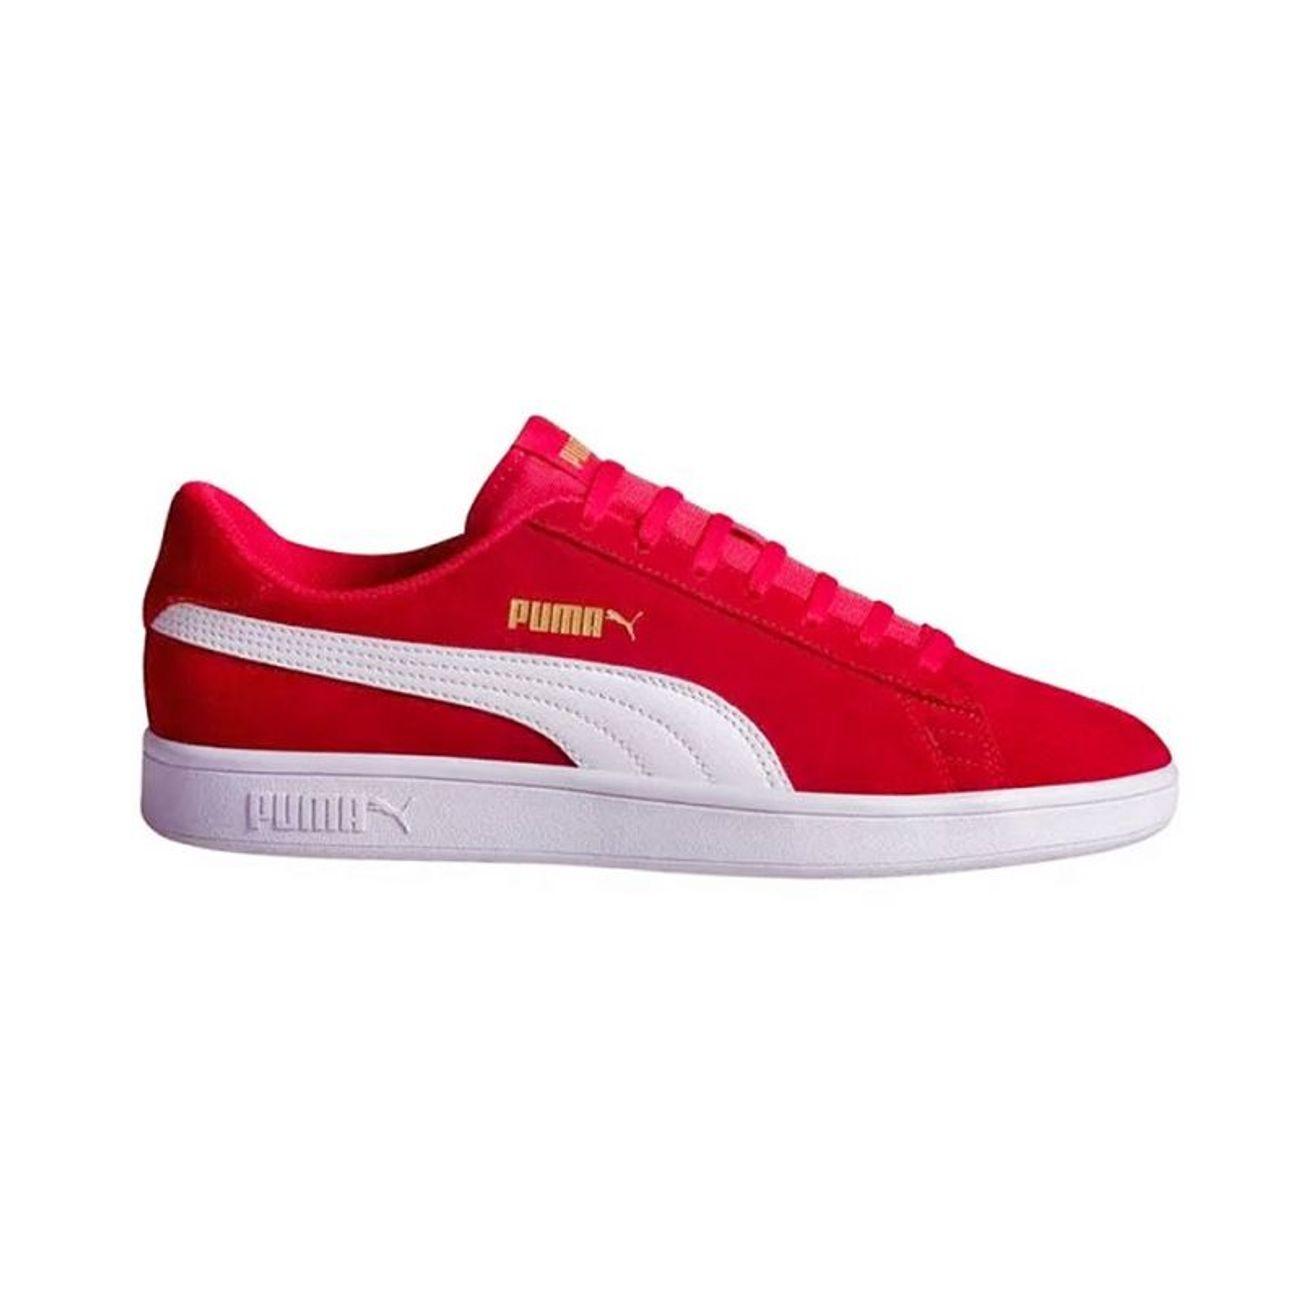 Padel Puma V2 Smash Blanco Rojo 22 364989 Adulte OiTPuXZk